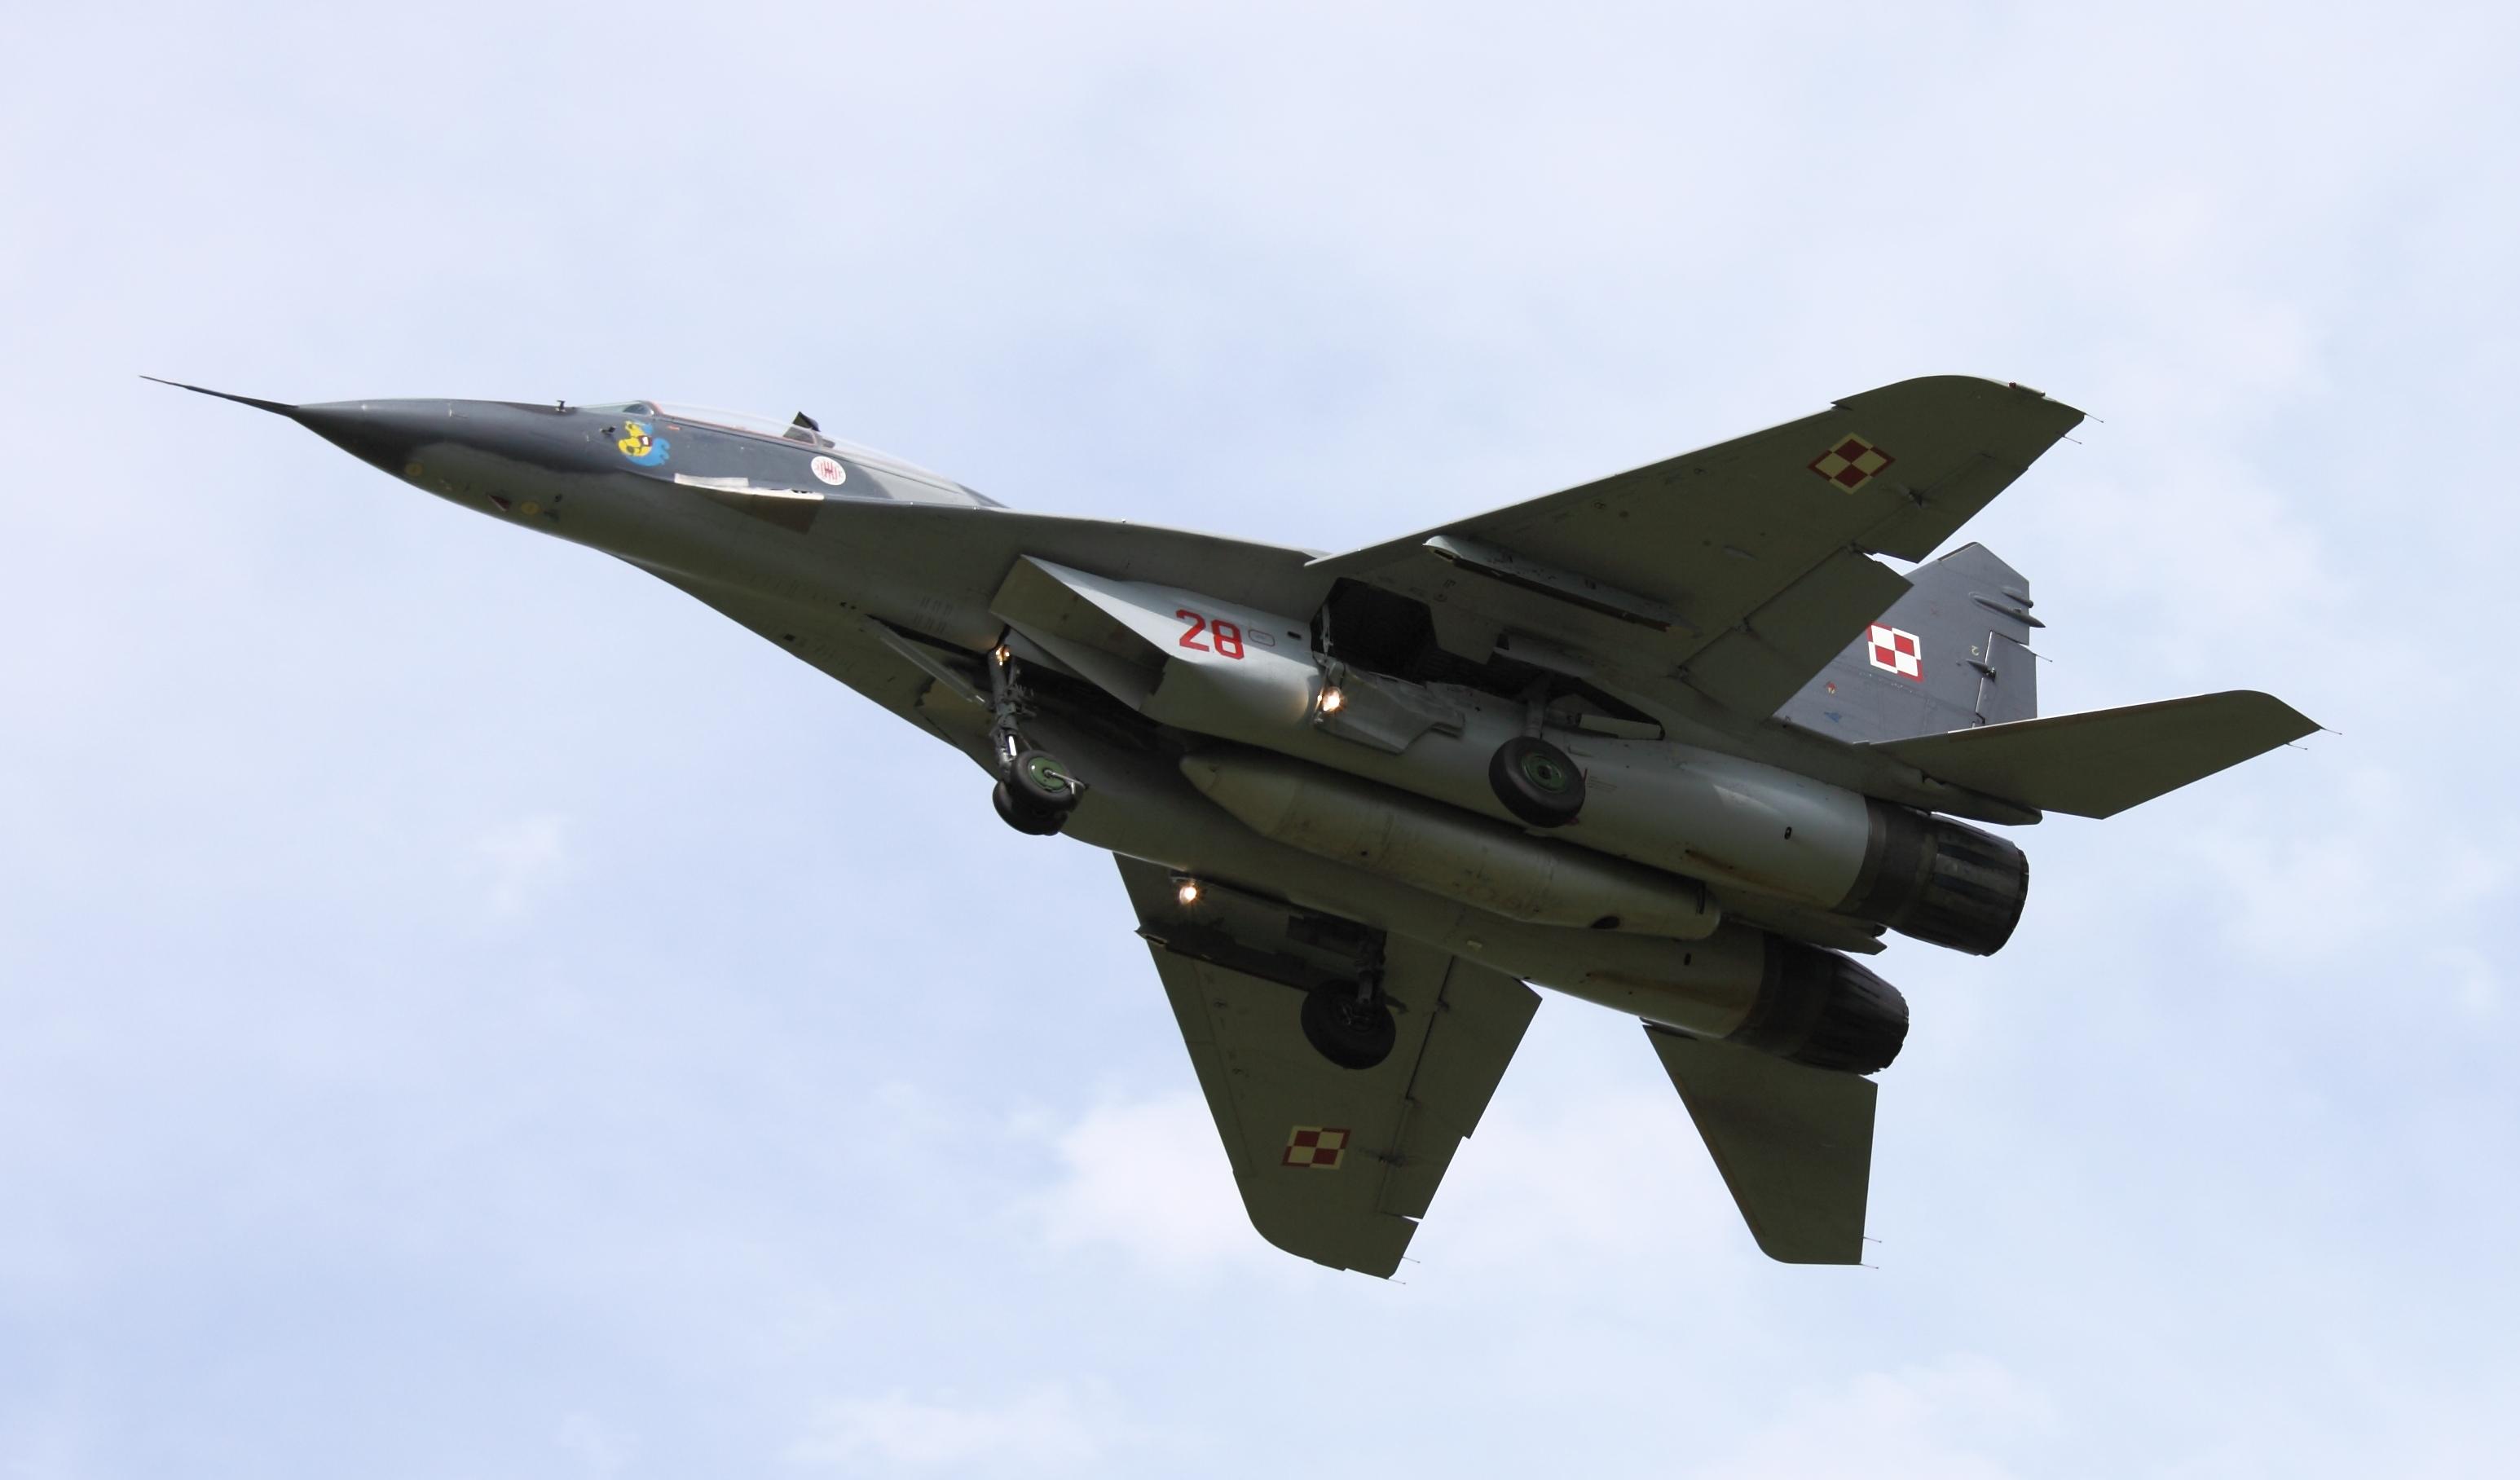 File:MiG-29UB 28.JPG - Wikimedia Commons